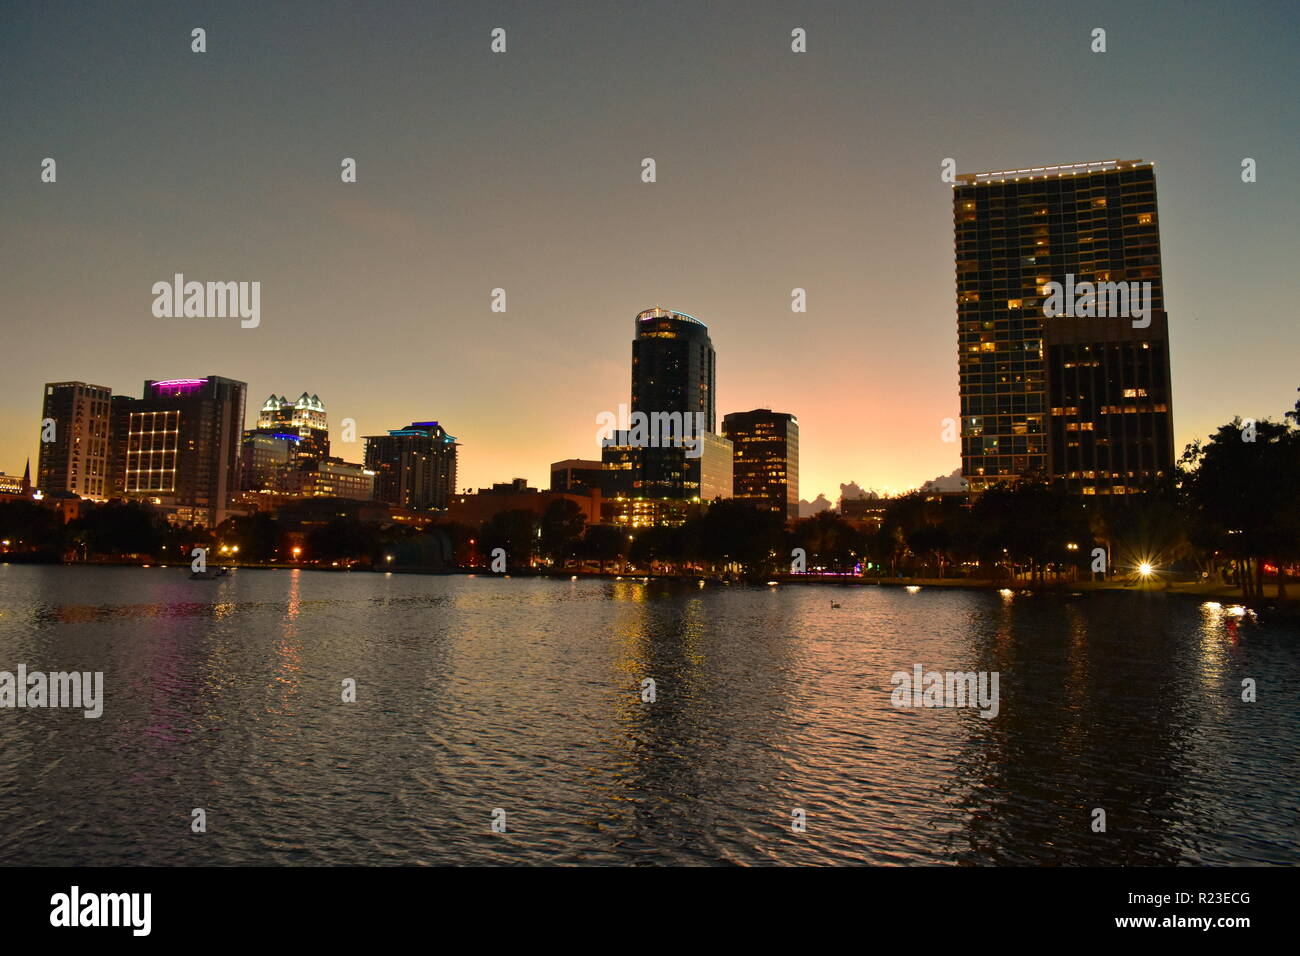 Orlando, Florida. October 16, 2018 Iluminated Downtown Buildings on magenta sunset at Eola Lake Park area. - Stock Image